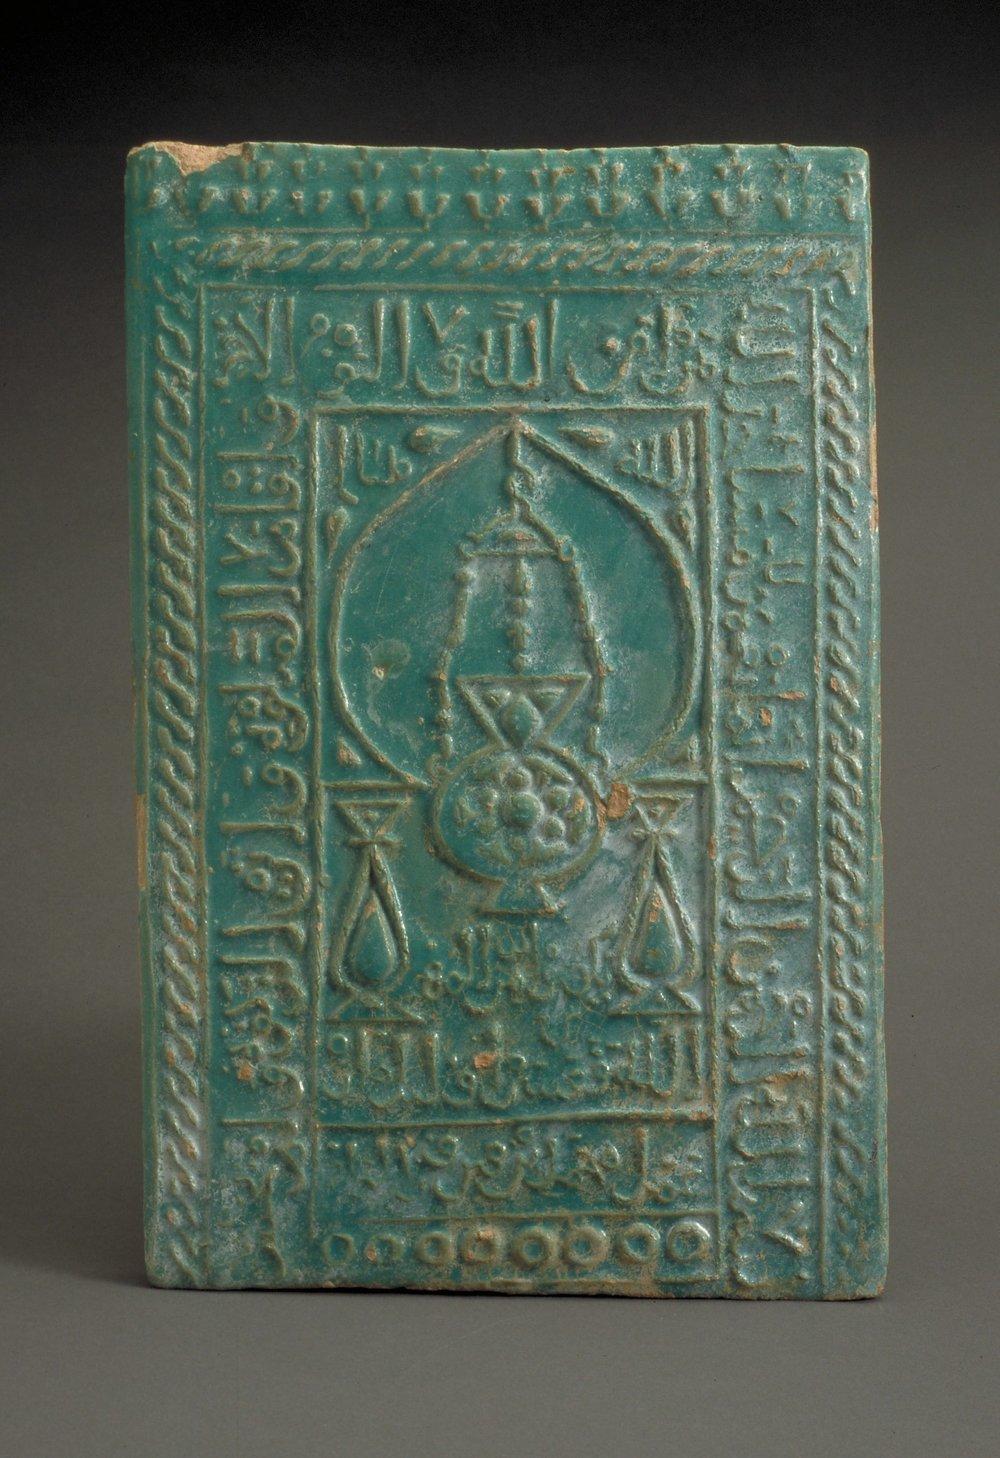 Green glazed Mihrab tile  Asian Civilisations Museum, c. 11th century  Credit: Asian Civilisations Museum